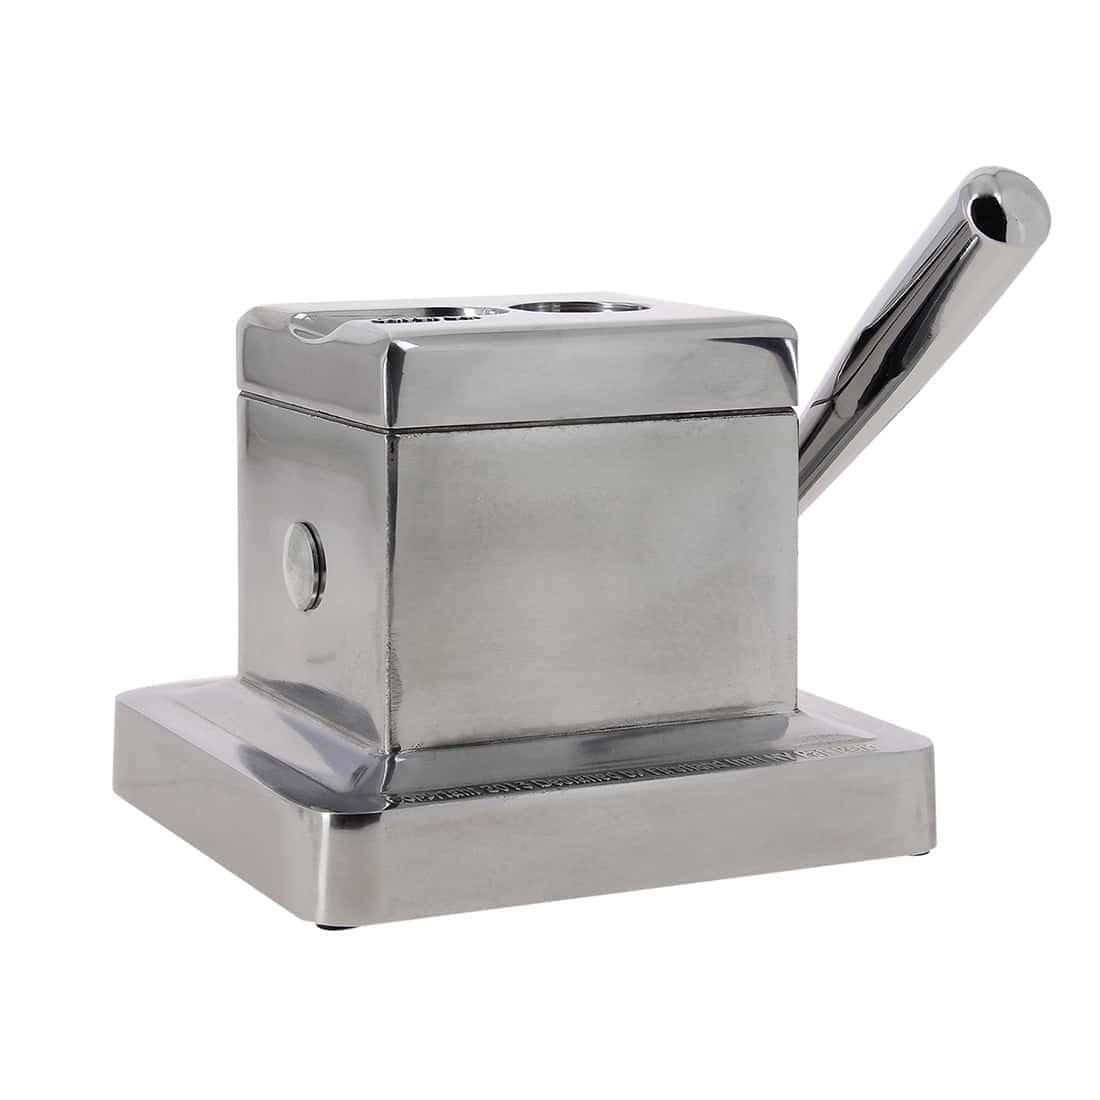 cuban cut 1 blade cigar cutter